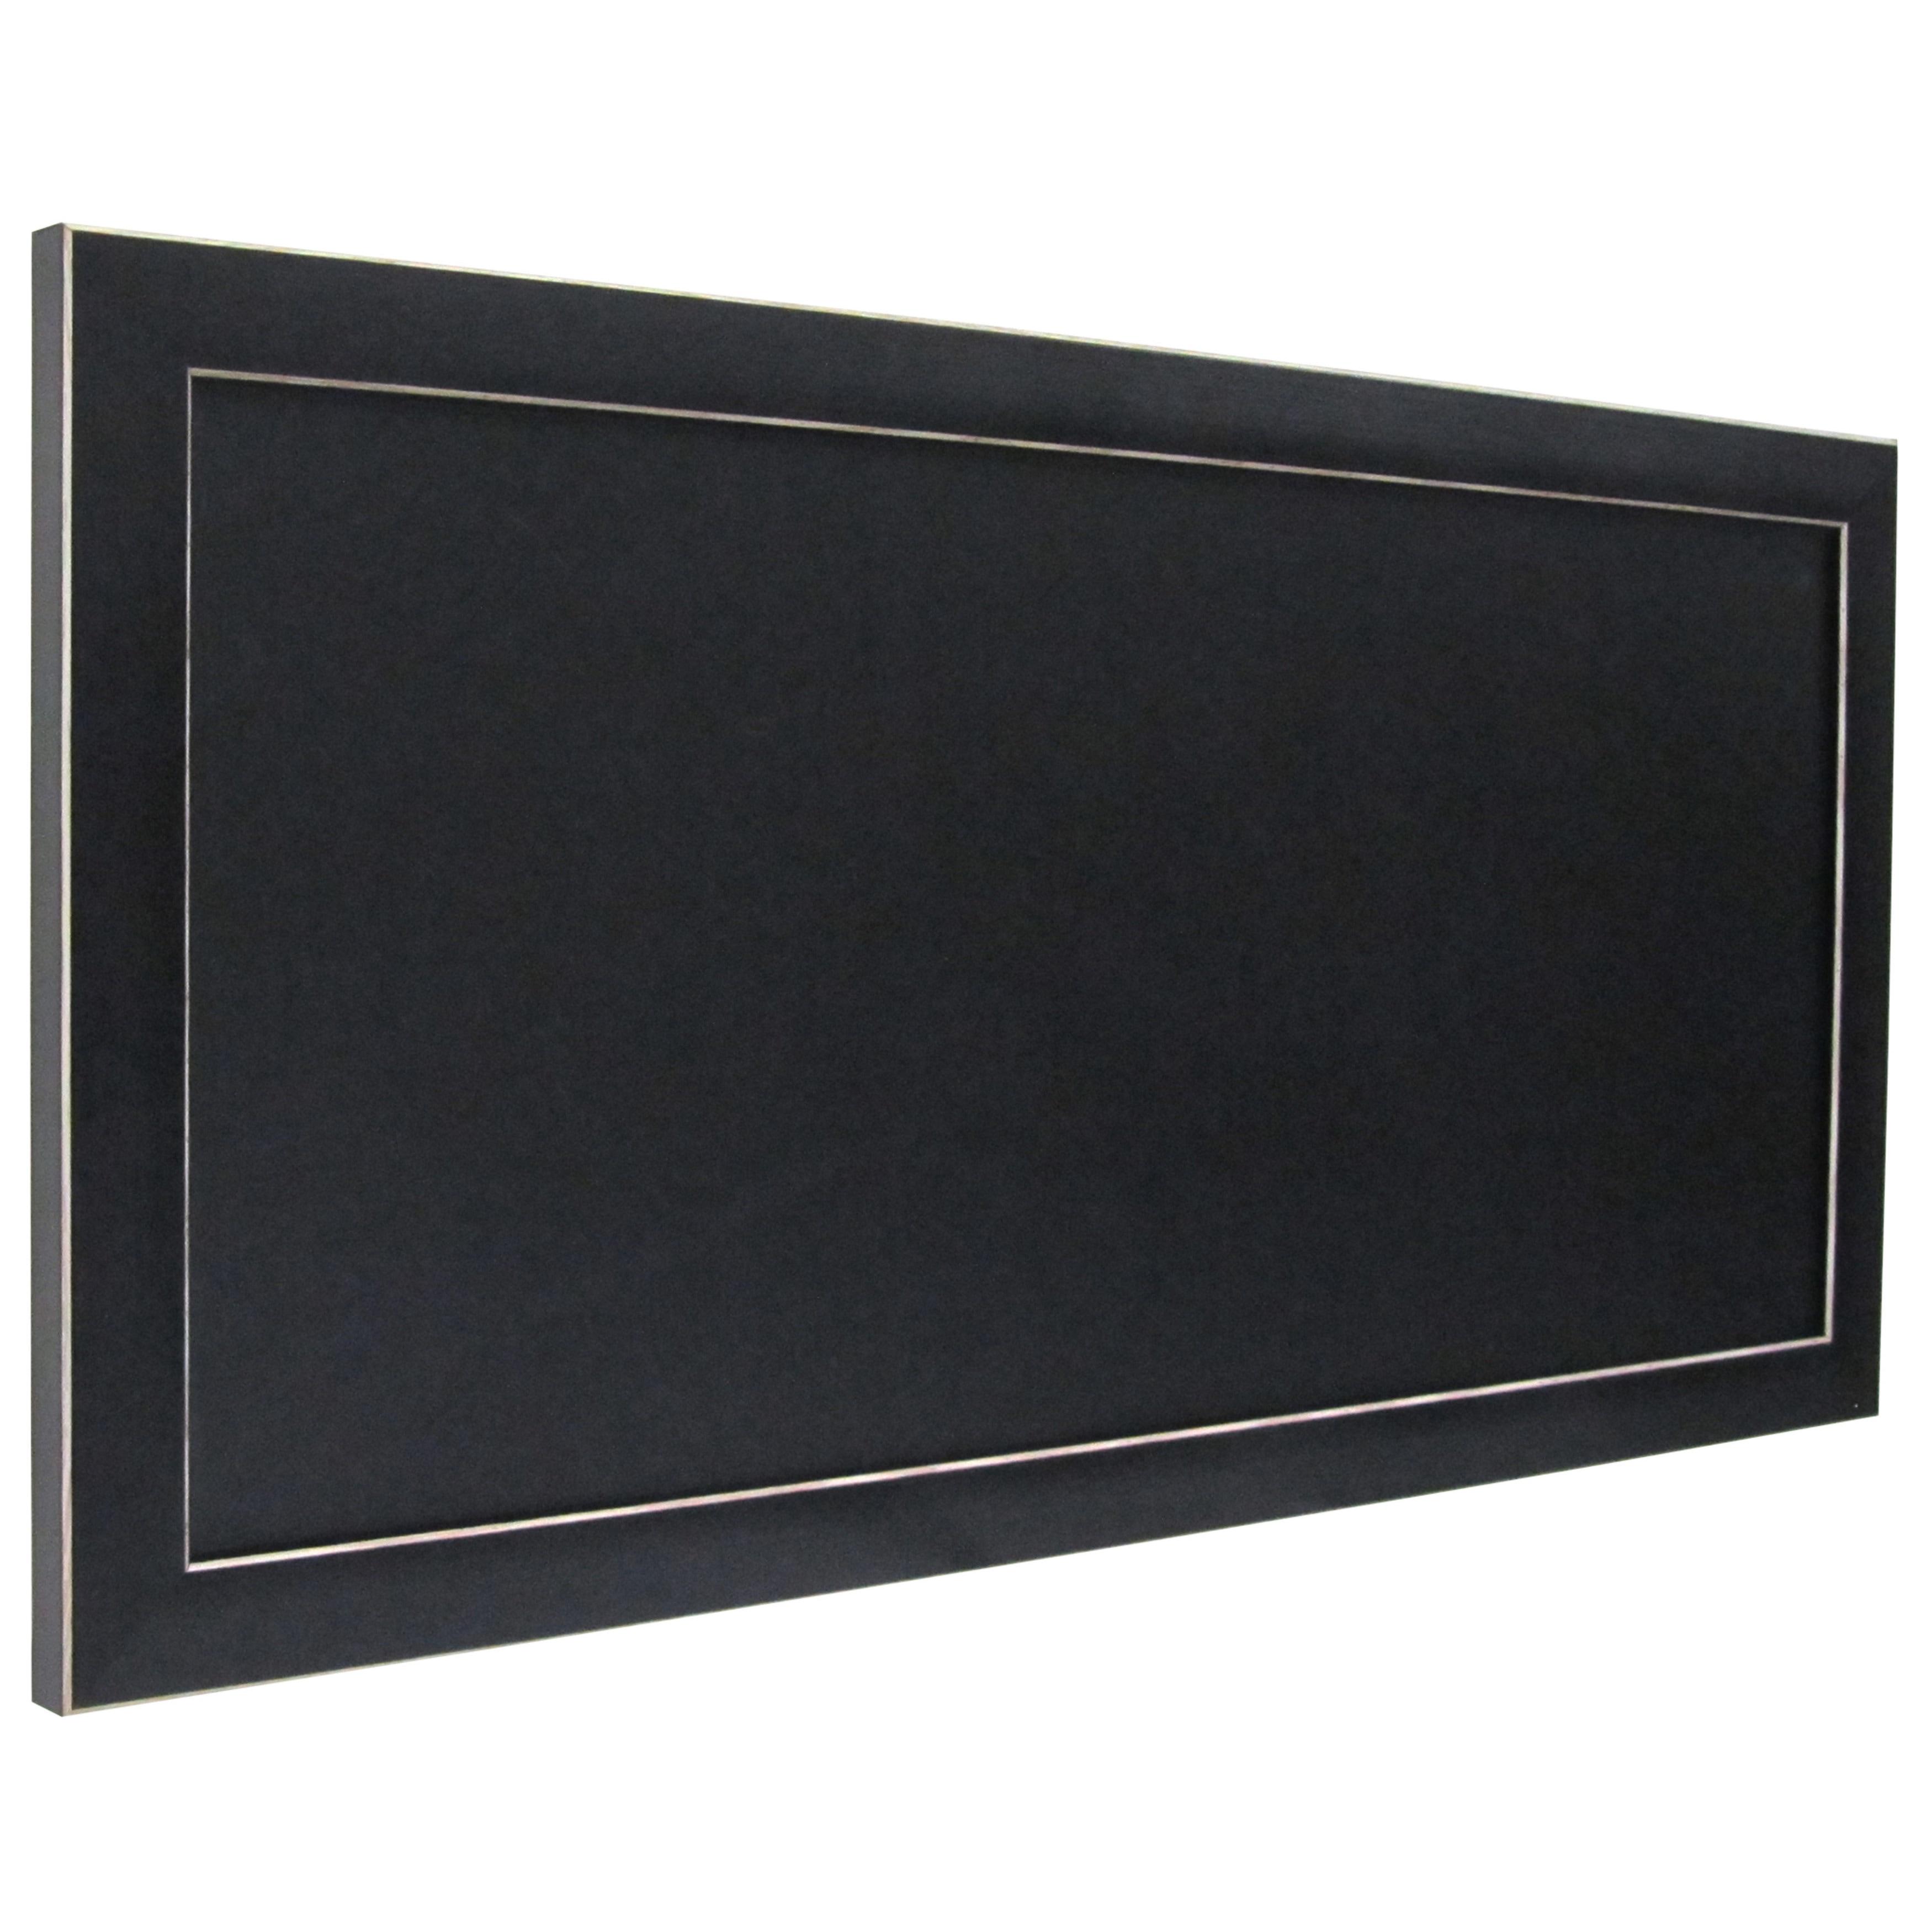 Black Framed Magnetic Chalkboard On Free Shipping Orders Over 45 11964472